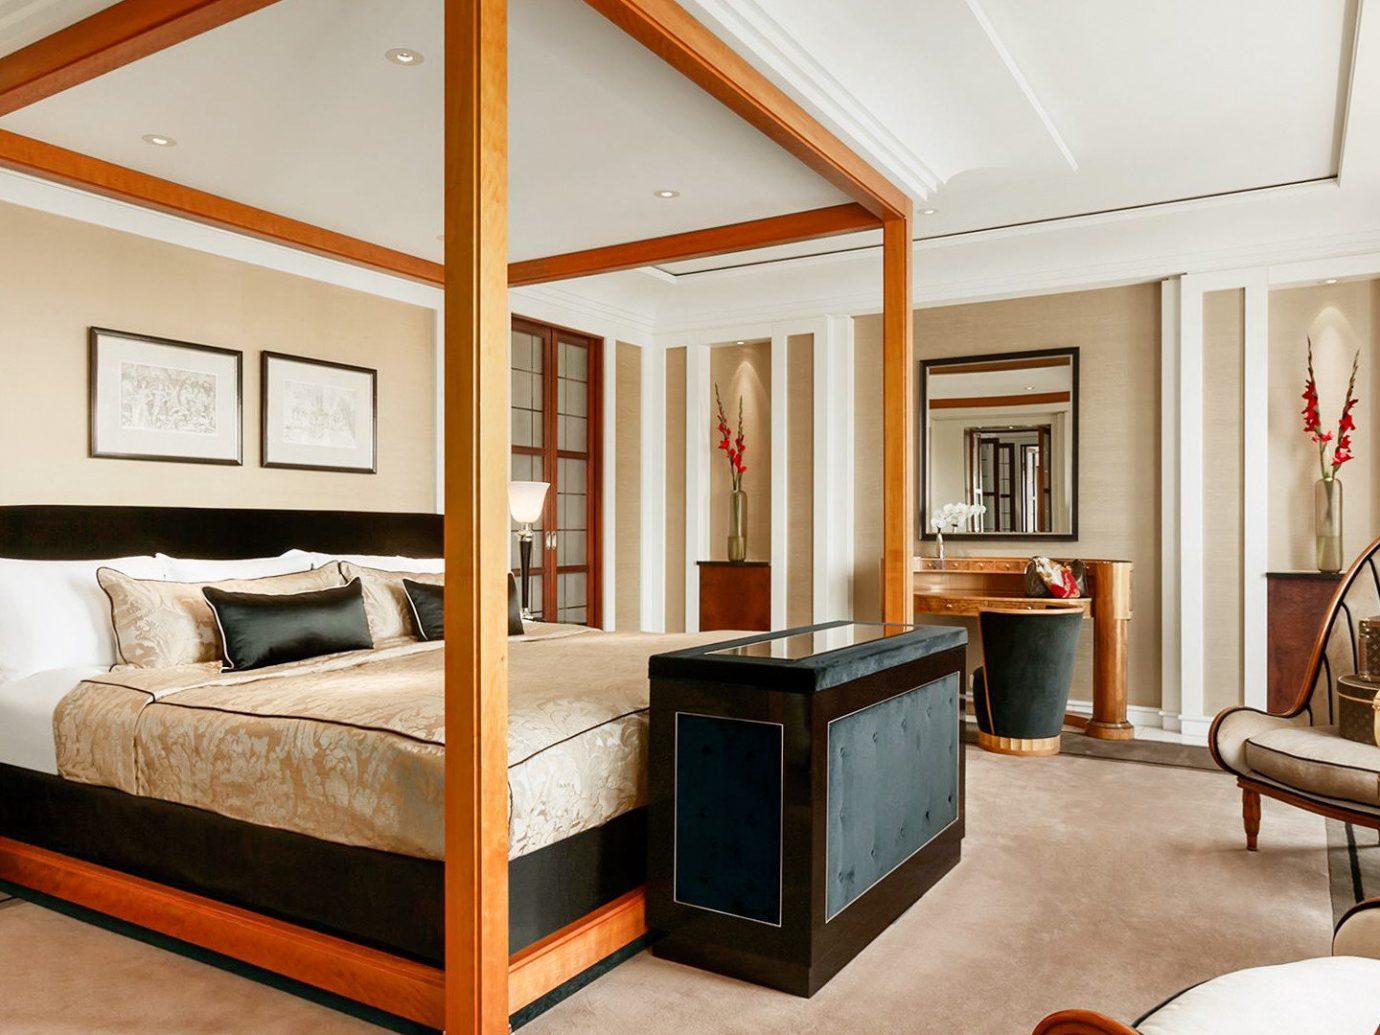 Berlin Boutique Hotels Germany Hotels Luxury Travel indoor floor wall room Suite interior design ceiling bed Bedroom real estate furniture window living room flooring